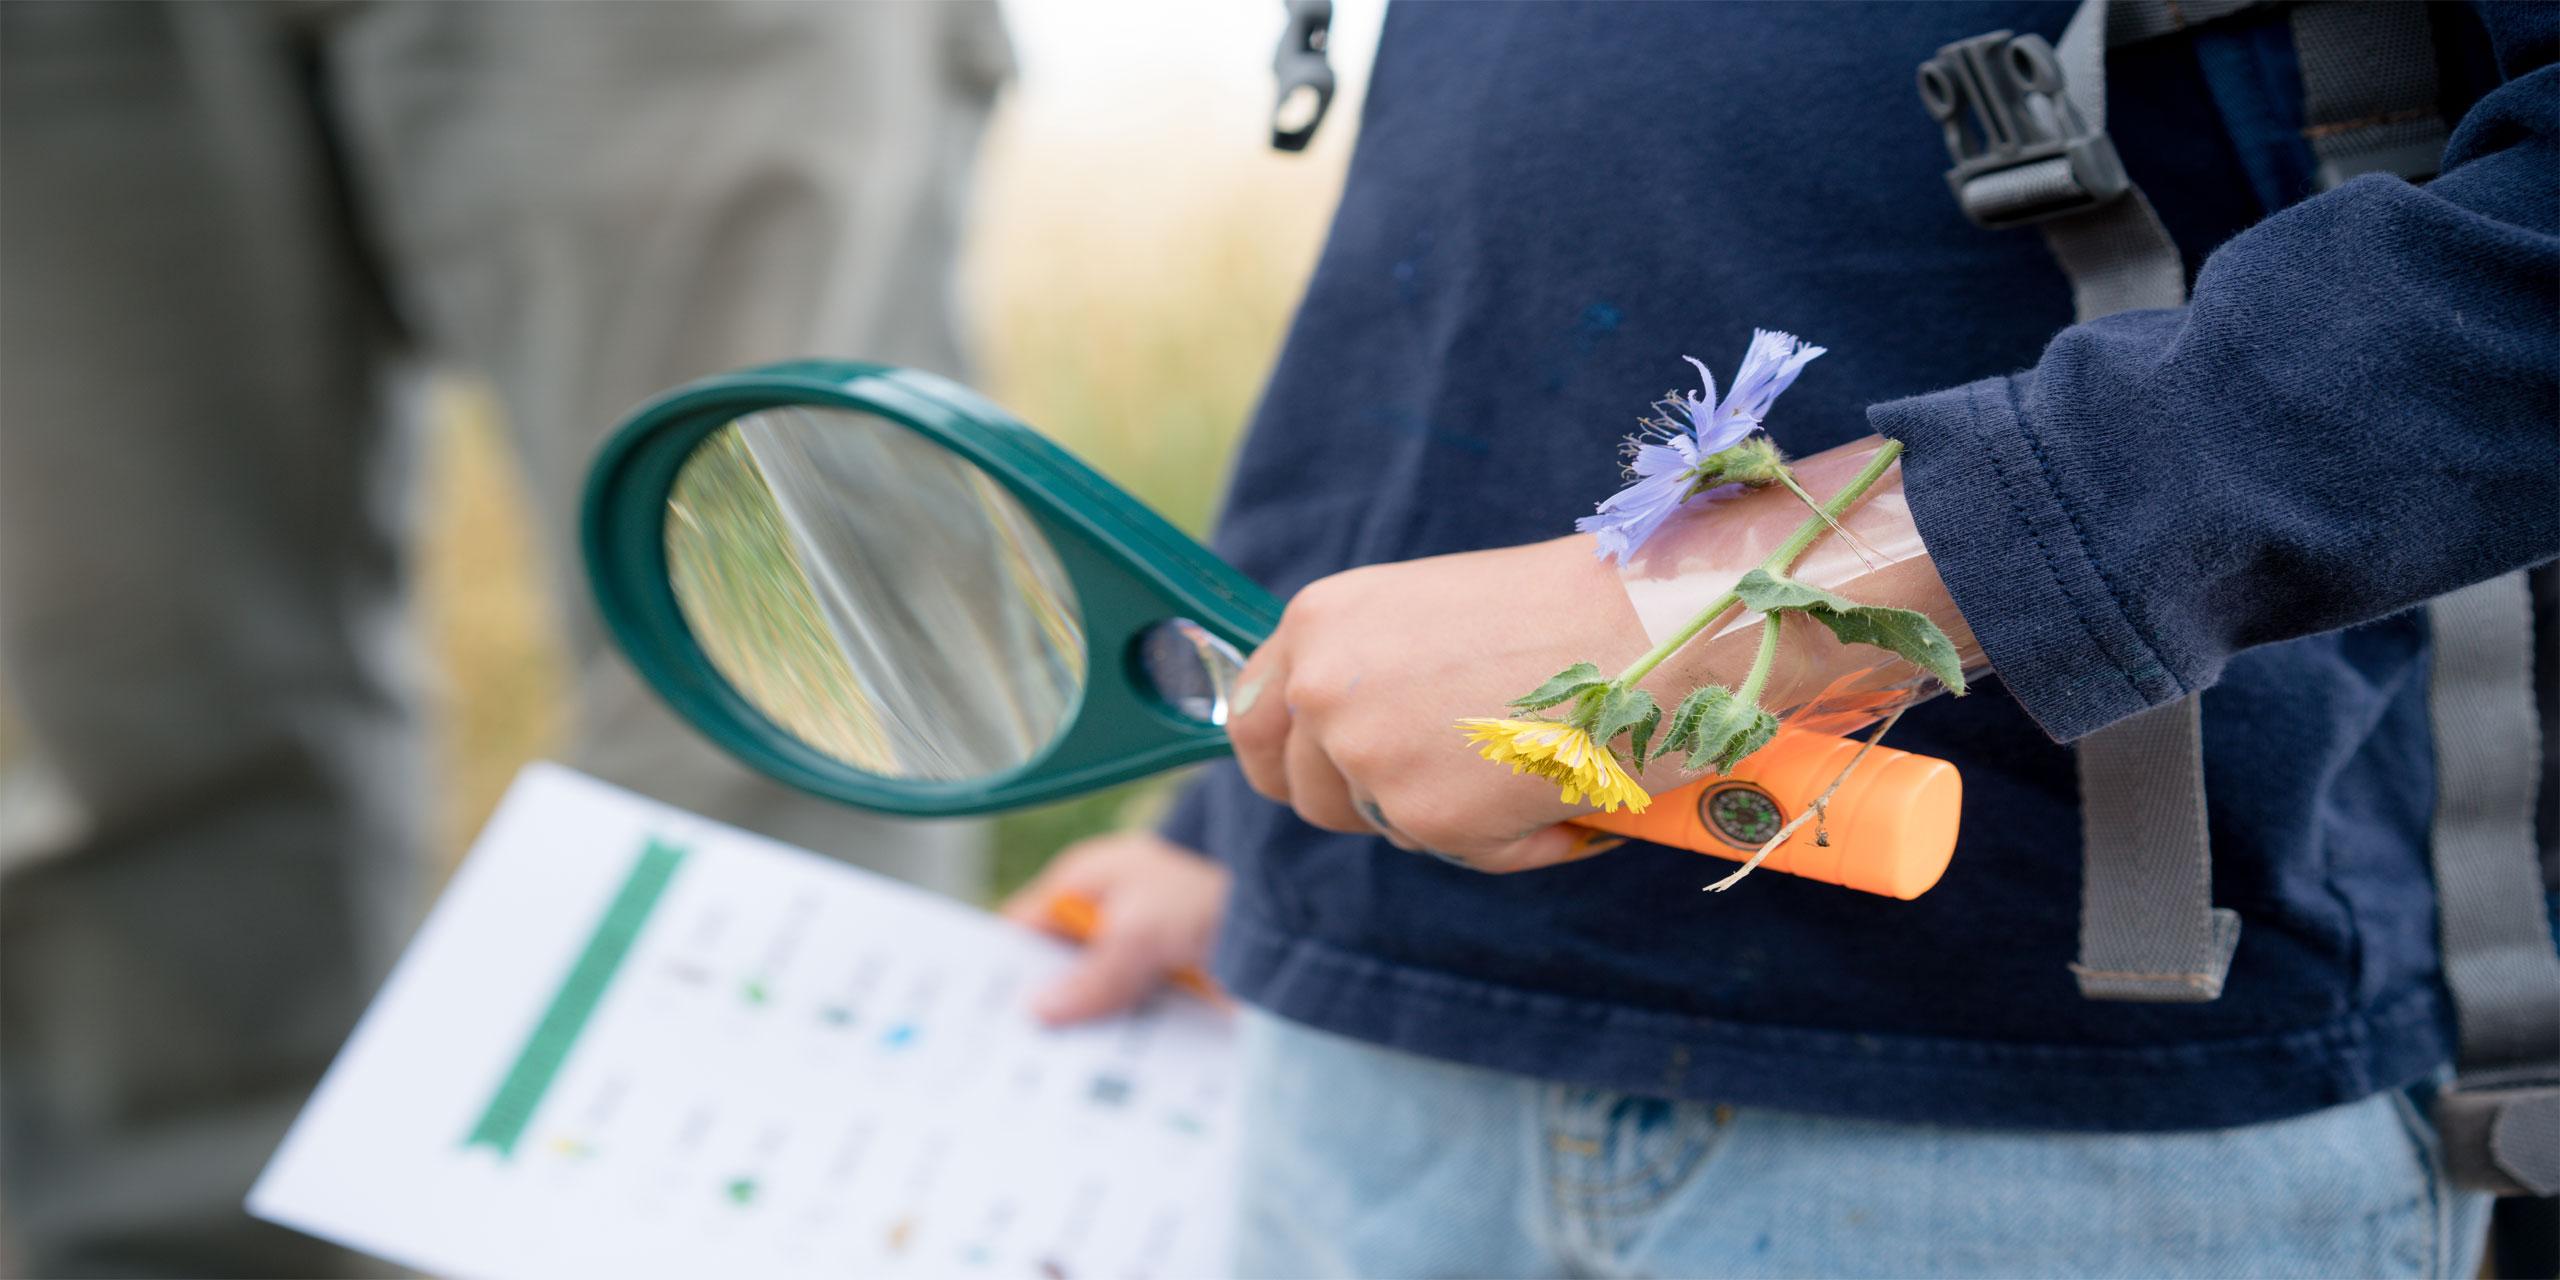 Scavenger Hunt; Courtesy of Robin Craig/Shutterstock.com